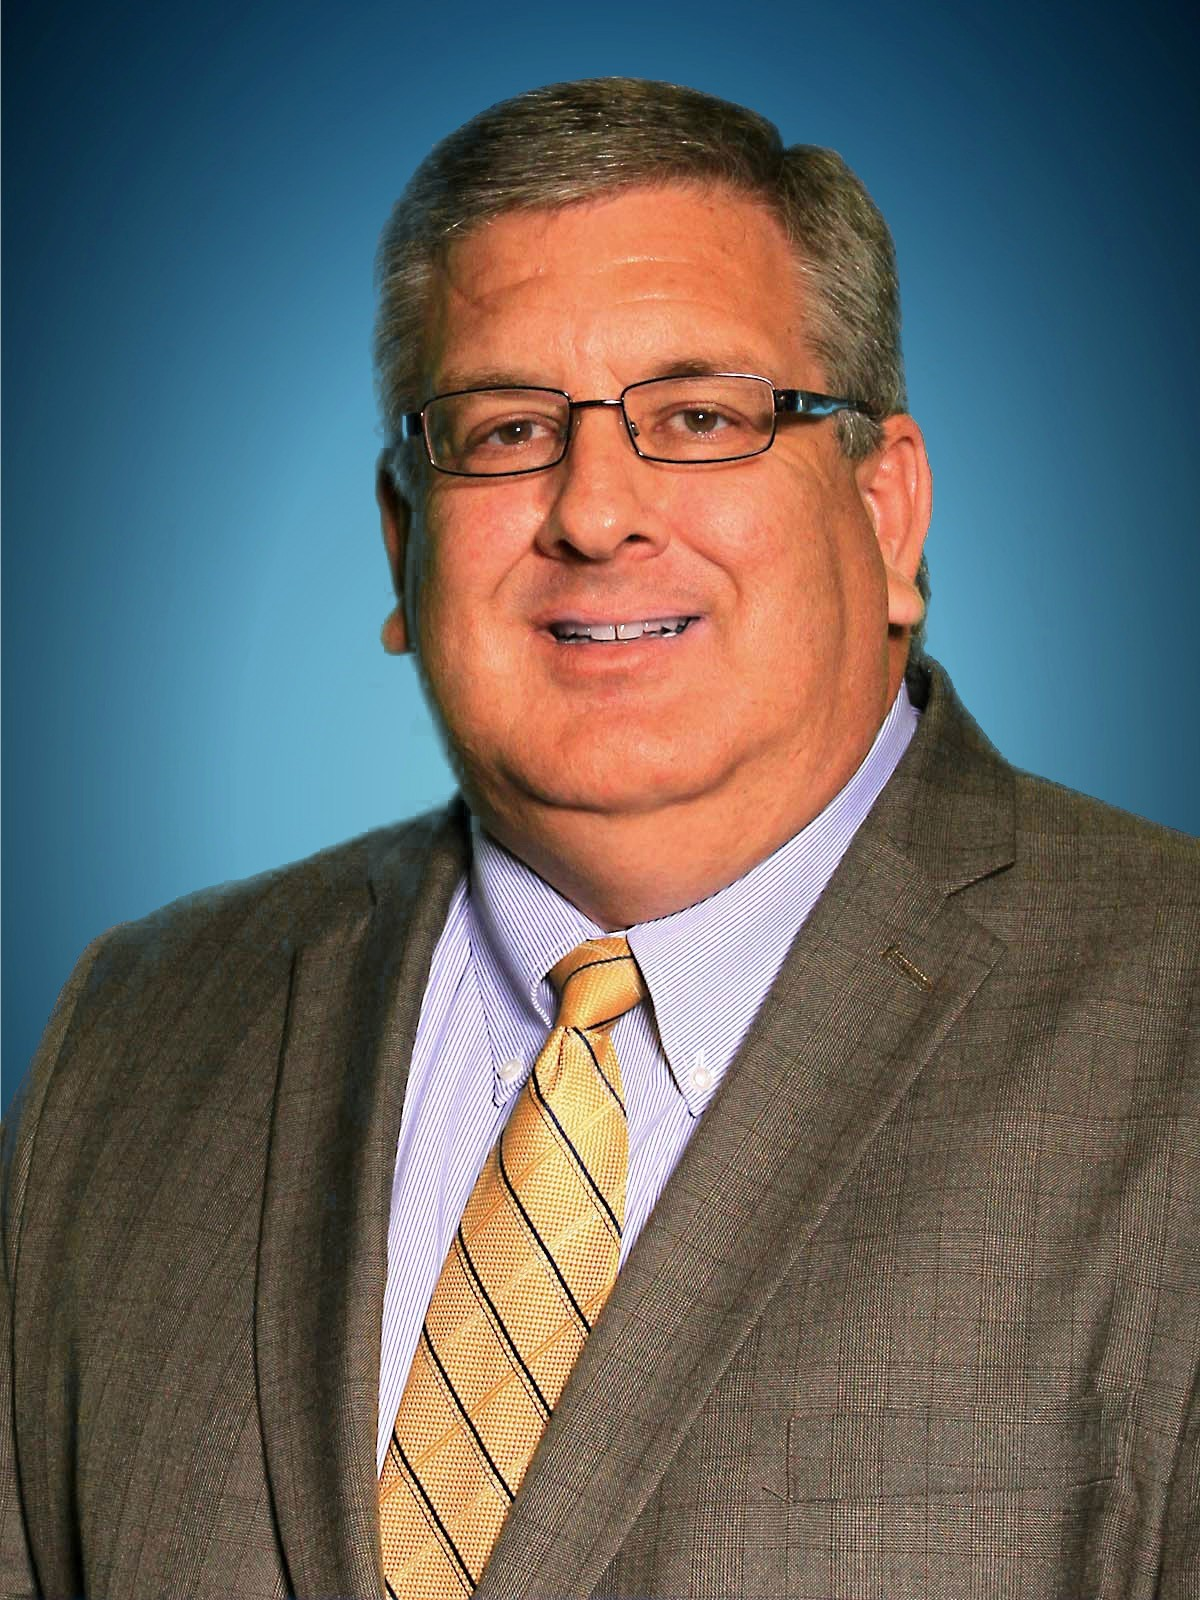 Ward named new AD at Abilene Christian